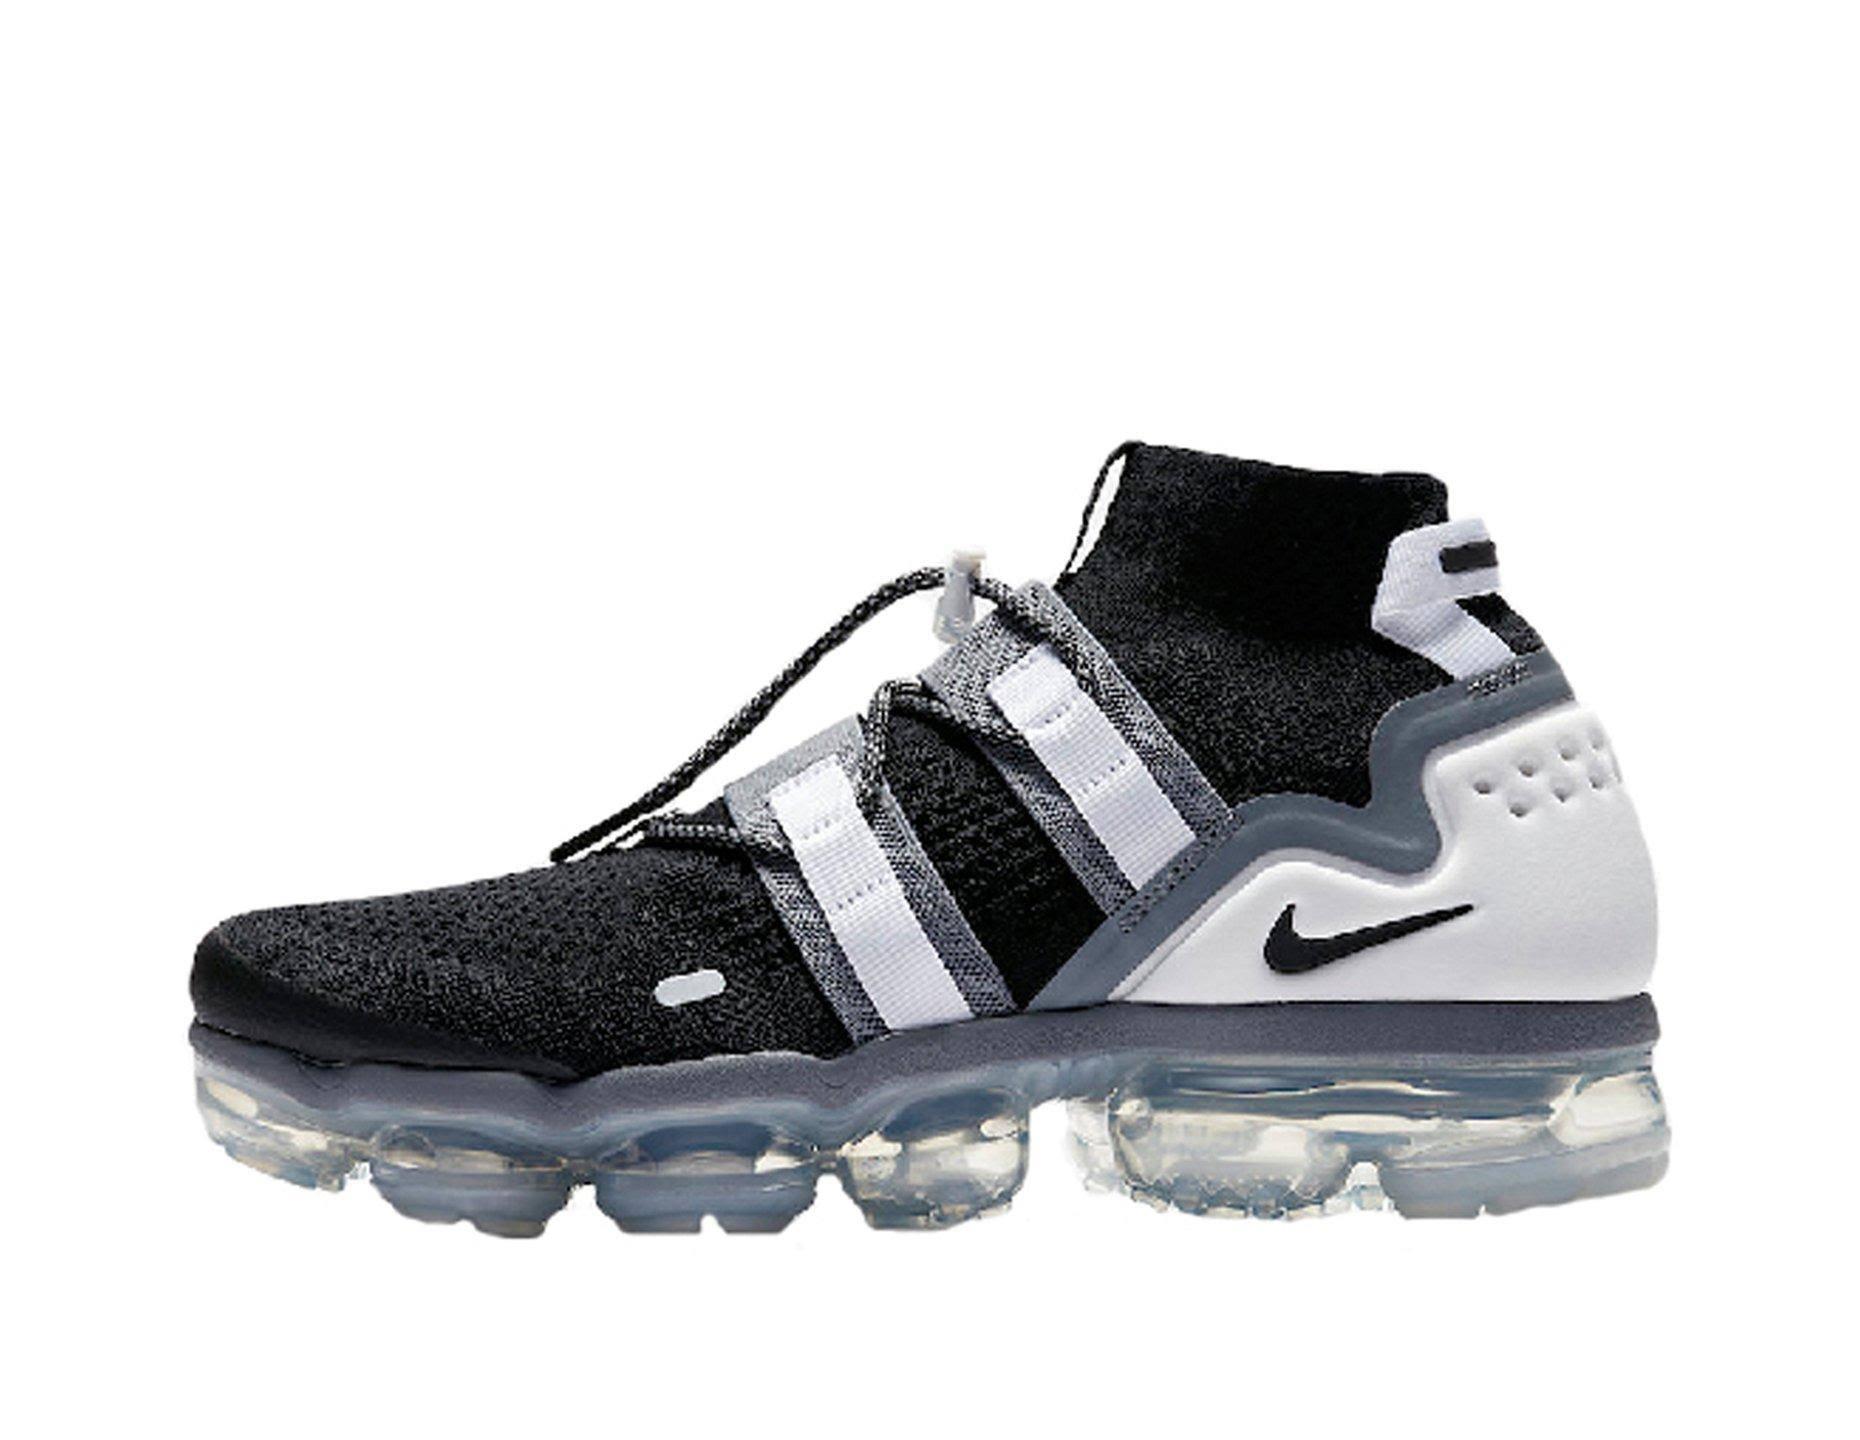 freddo Flyknit 5 Air Nike uomo nere taglia 7 UtilityScarpe Neronerogrigio Vapormax TuK1JcFl3